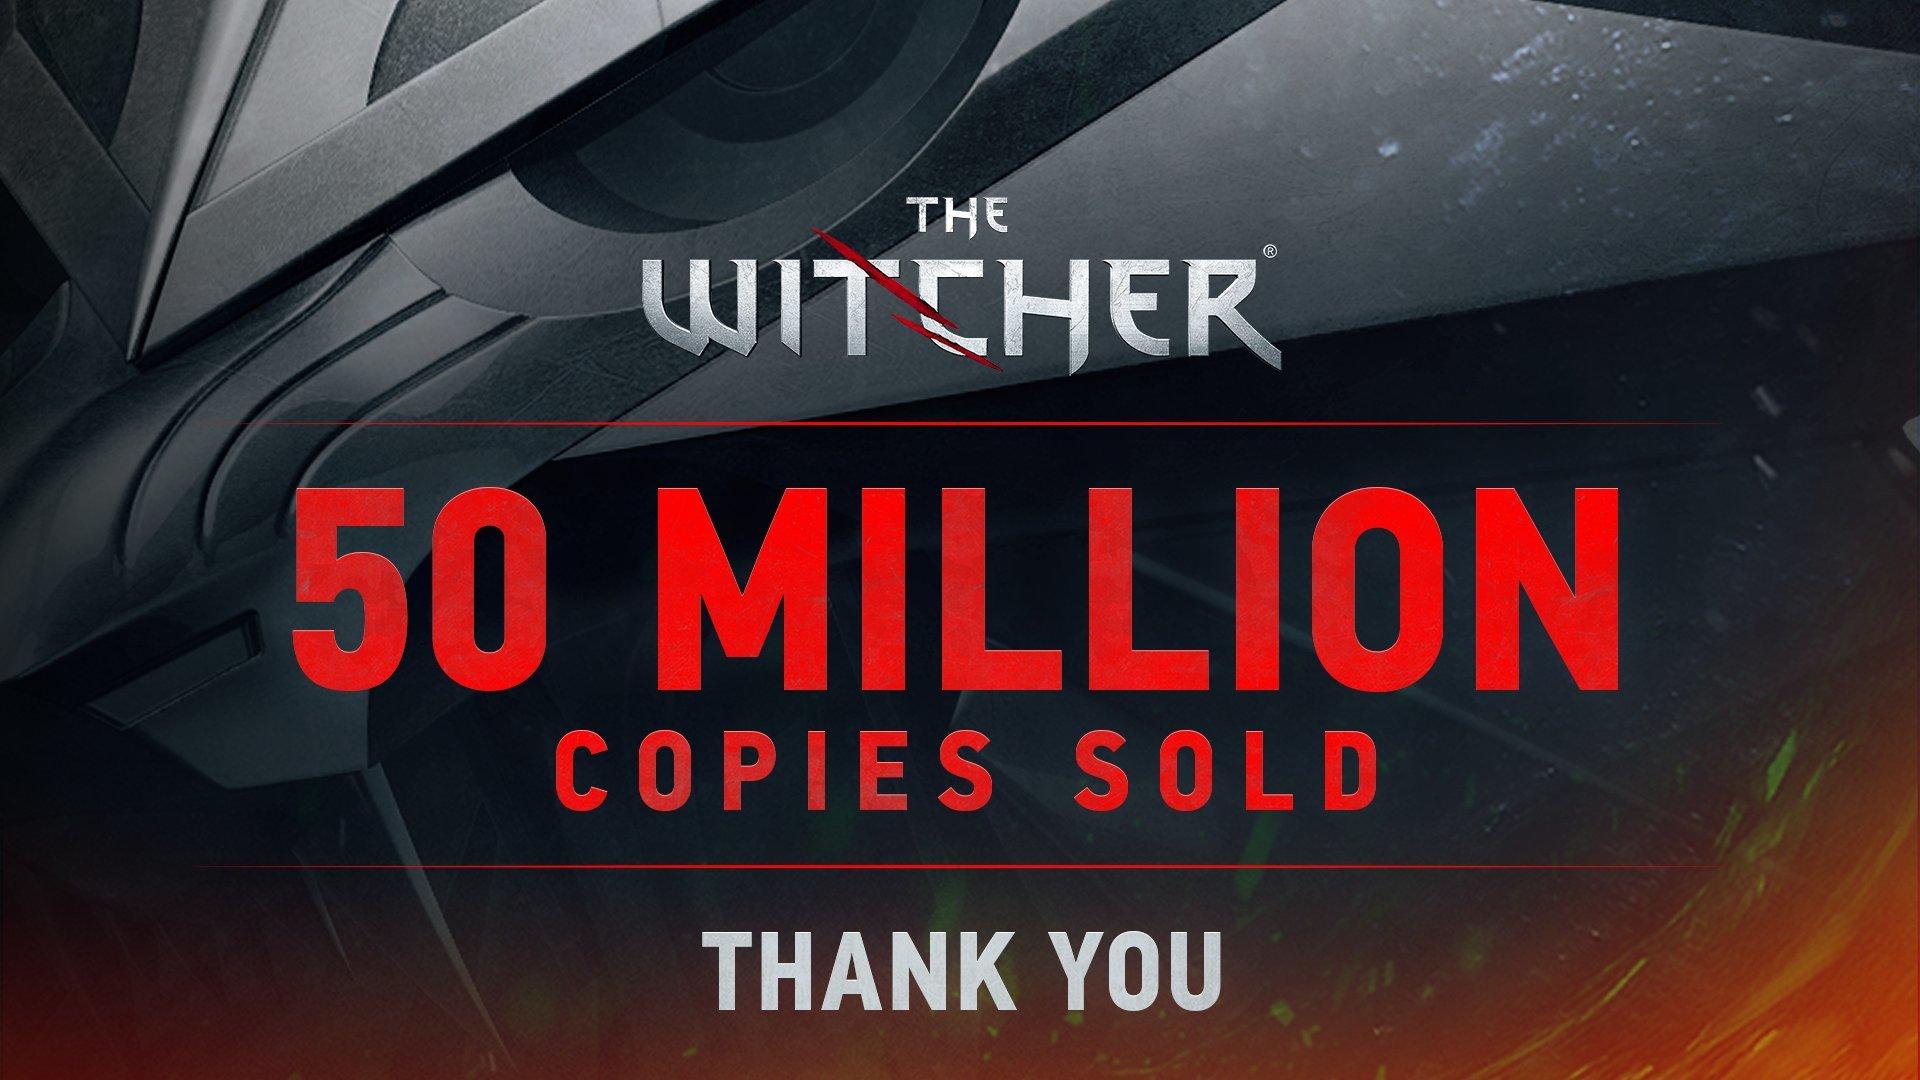 CD Projekt har sålt 50 miljoner The Witcher-spel